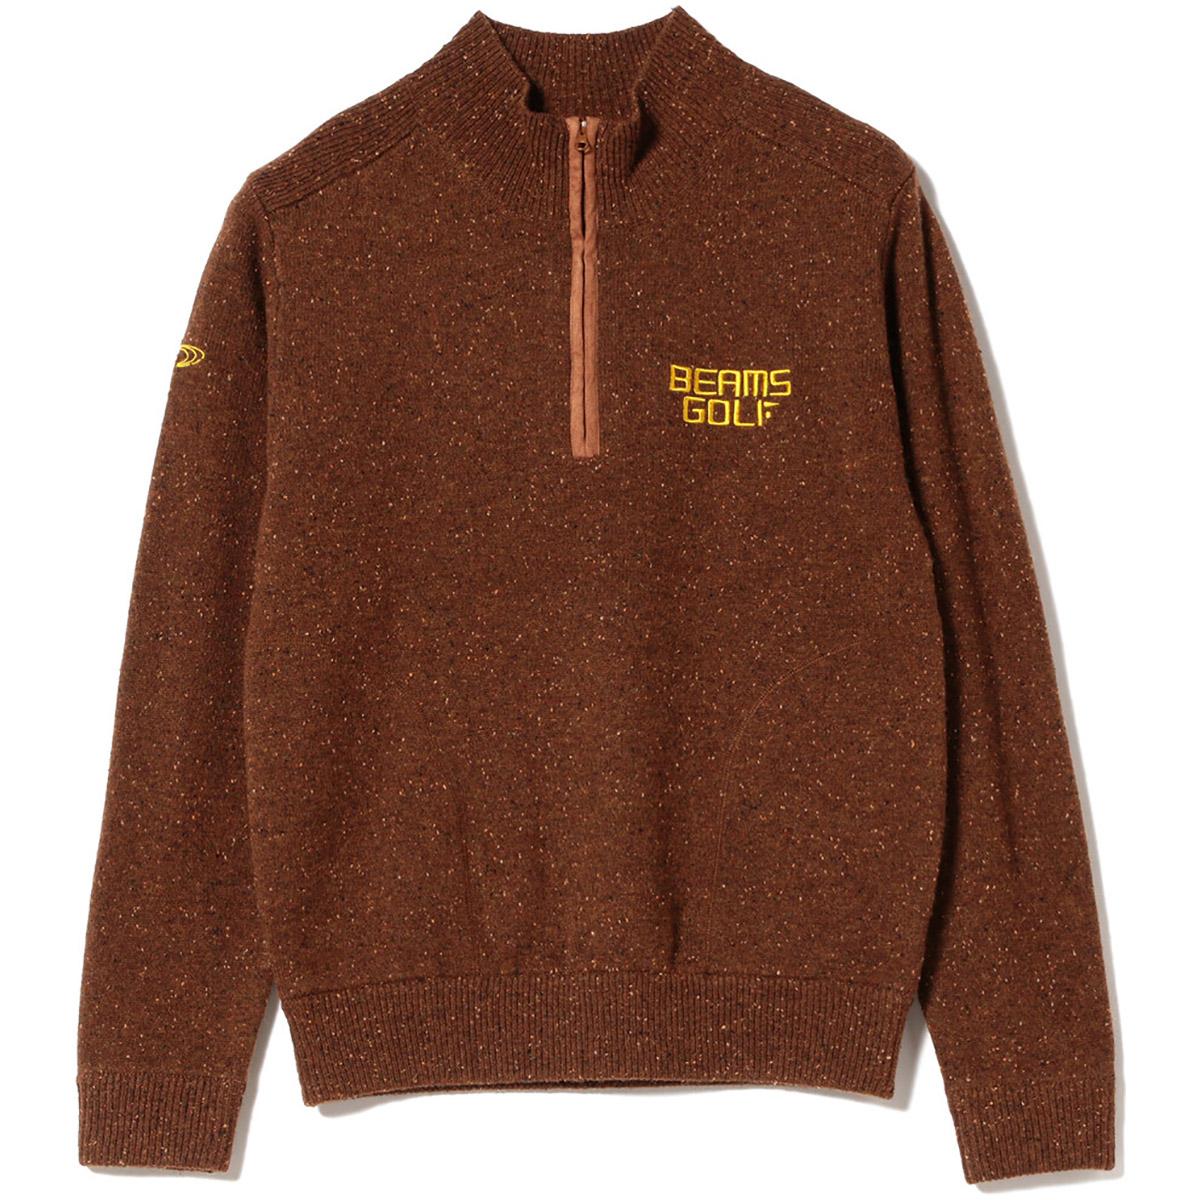 BEAMS GOLF ORANGE LABEL カラー ネップ プルオーバー セーター